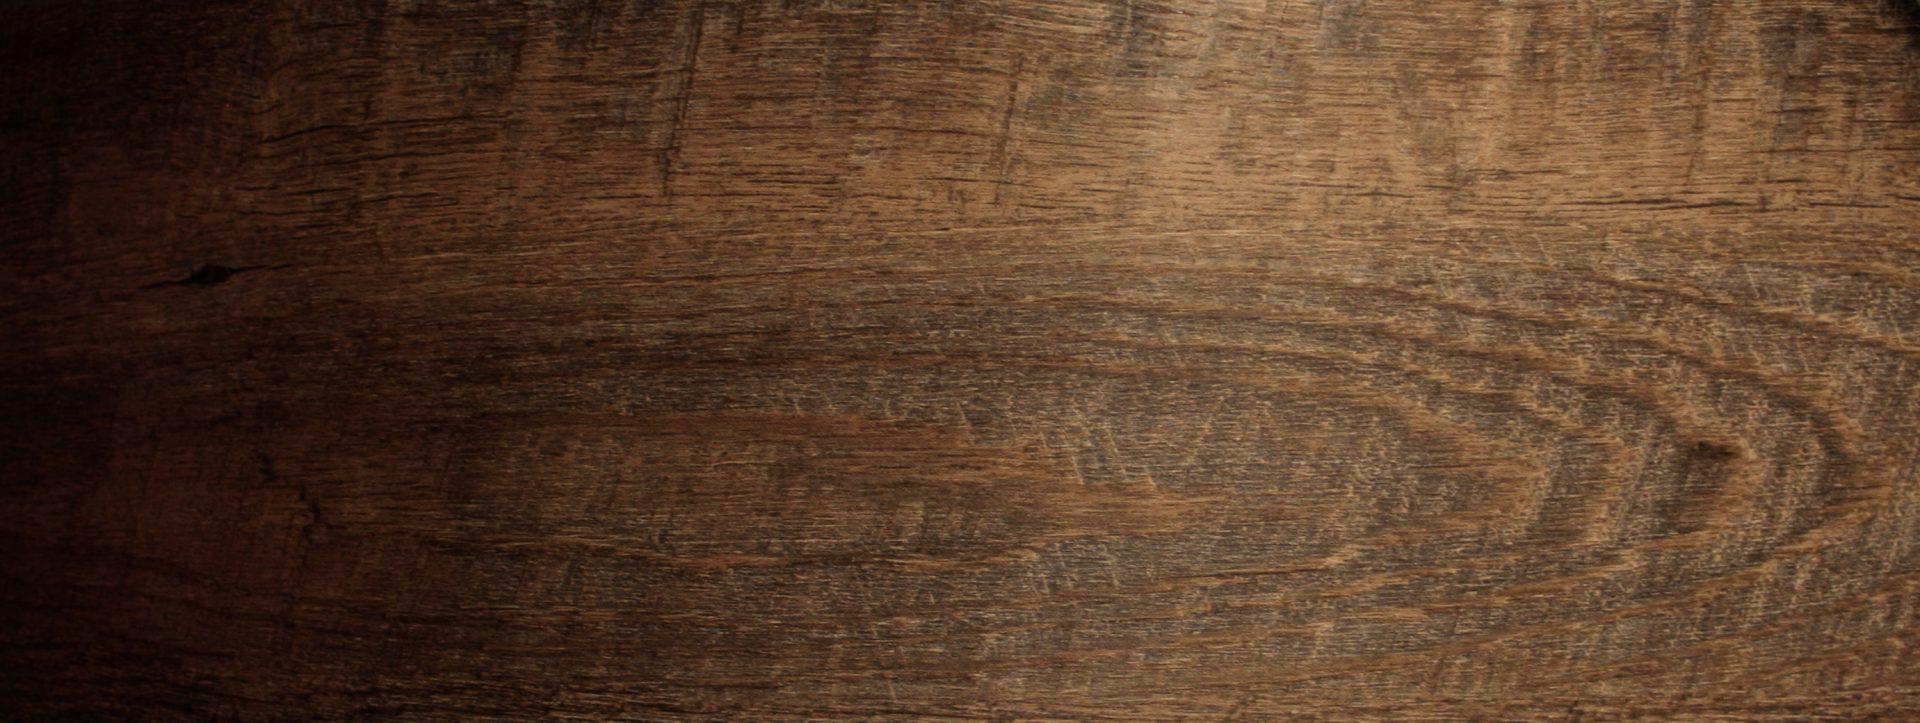 Laguna Rusty Pier Integrity Laminate Flooring